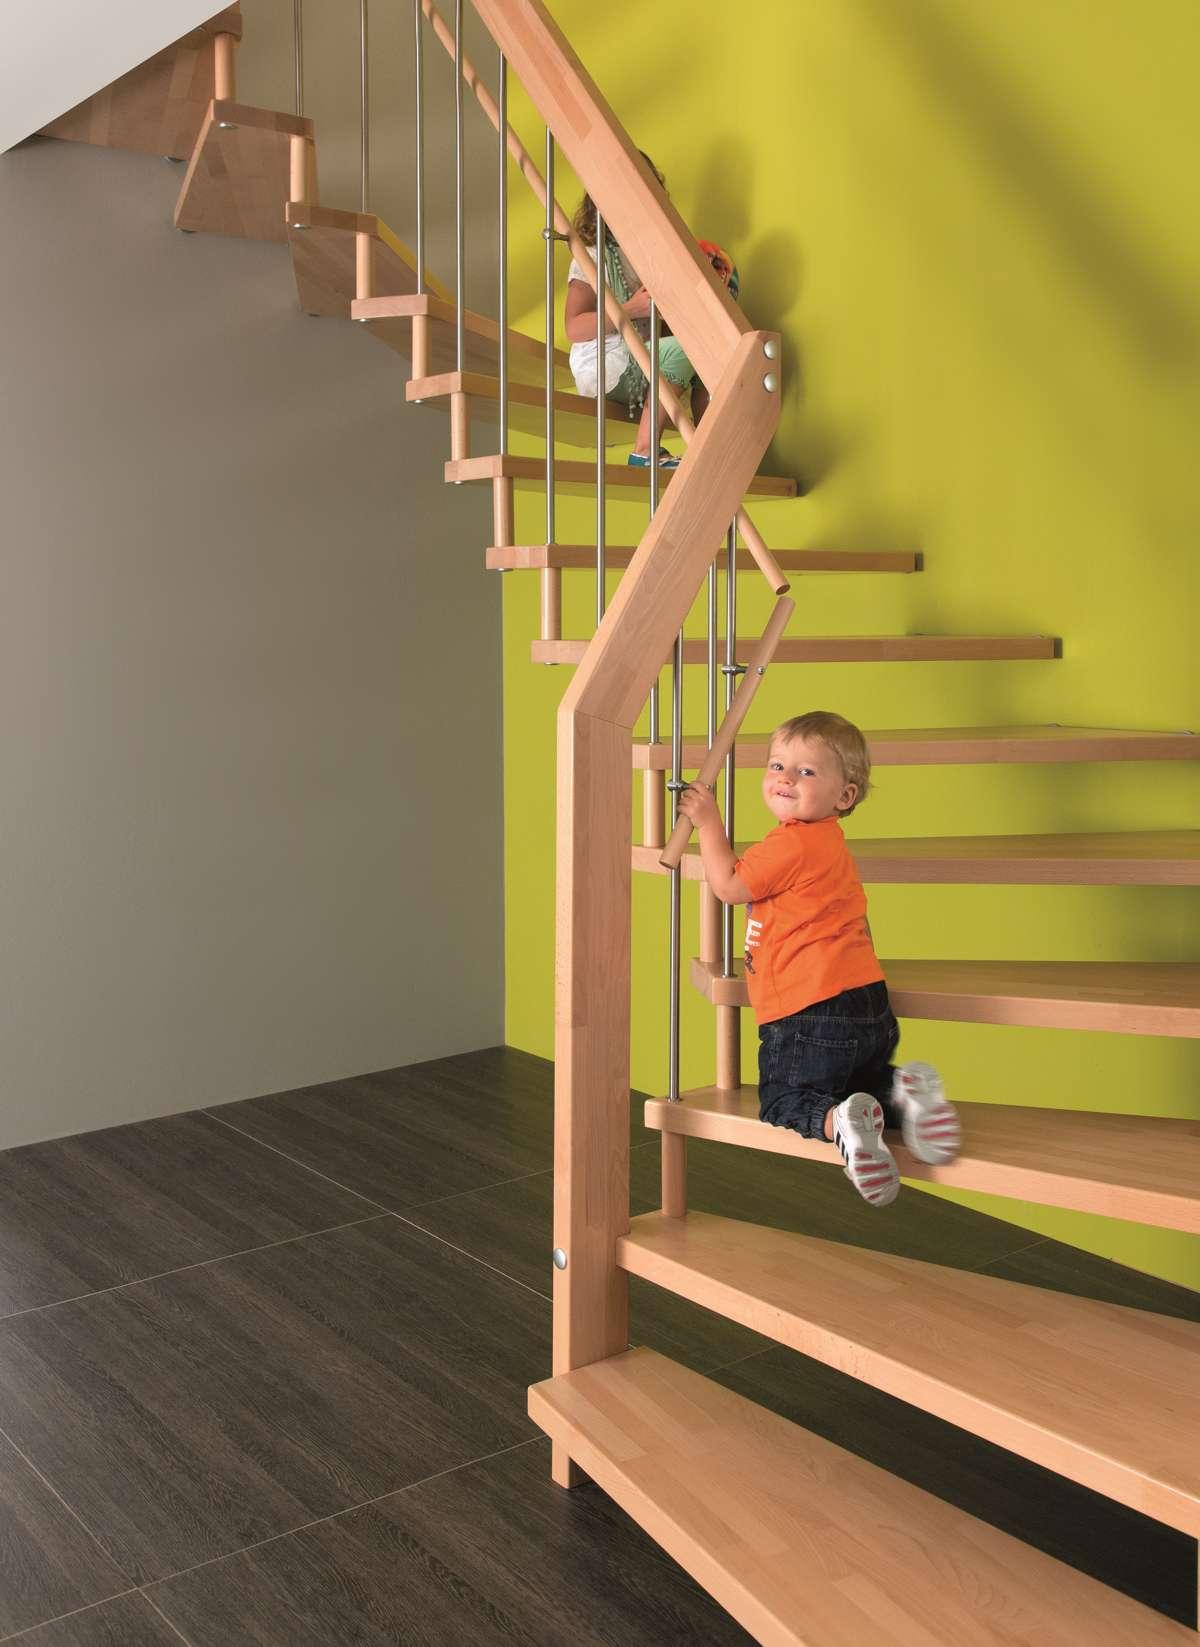 arcus treppen kindersichere treppen direkt beim hausbau planen. Black Bedroom Furniture Sets. Home Design Ideas